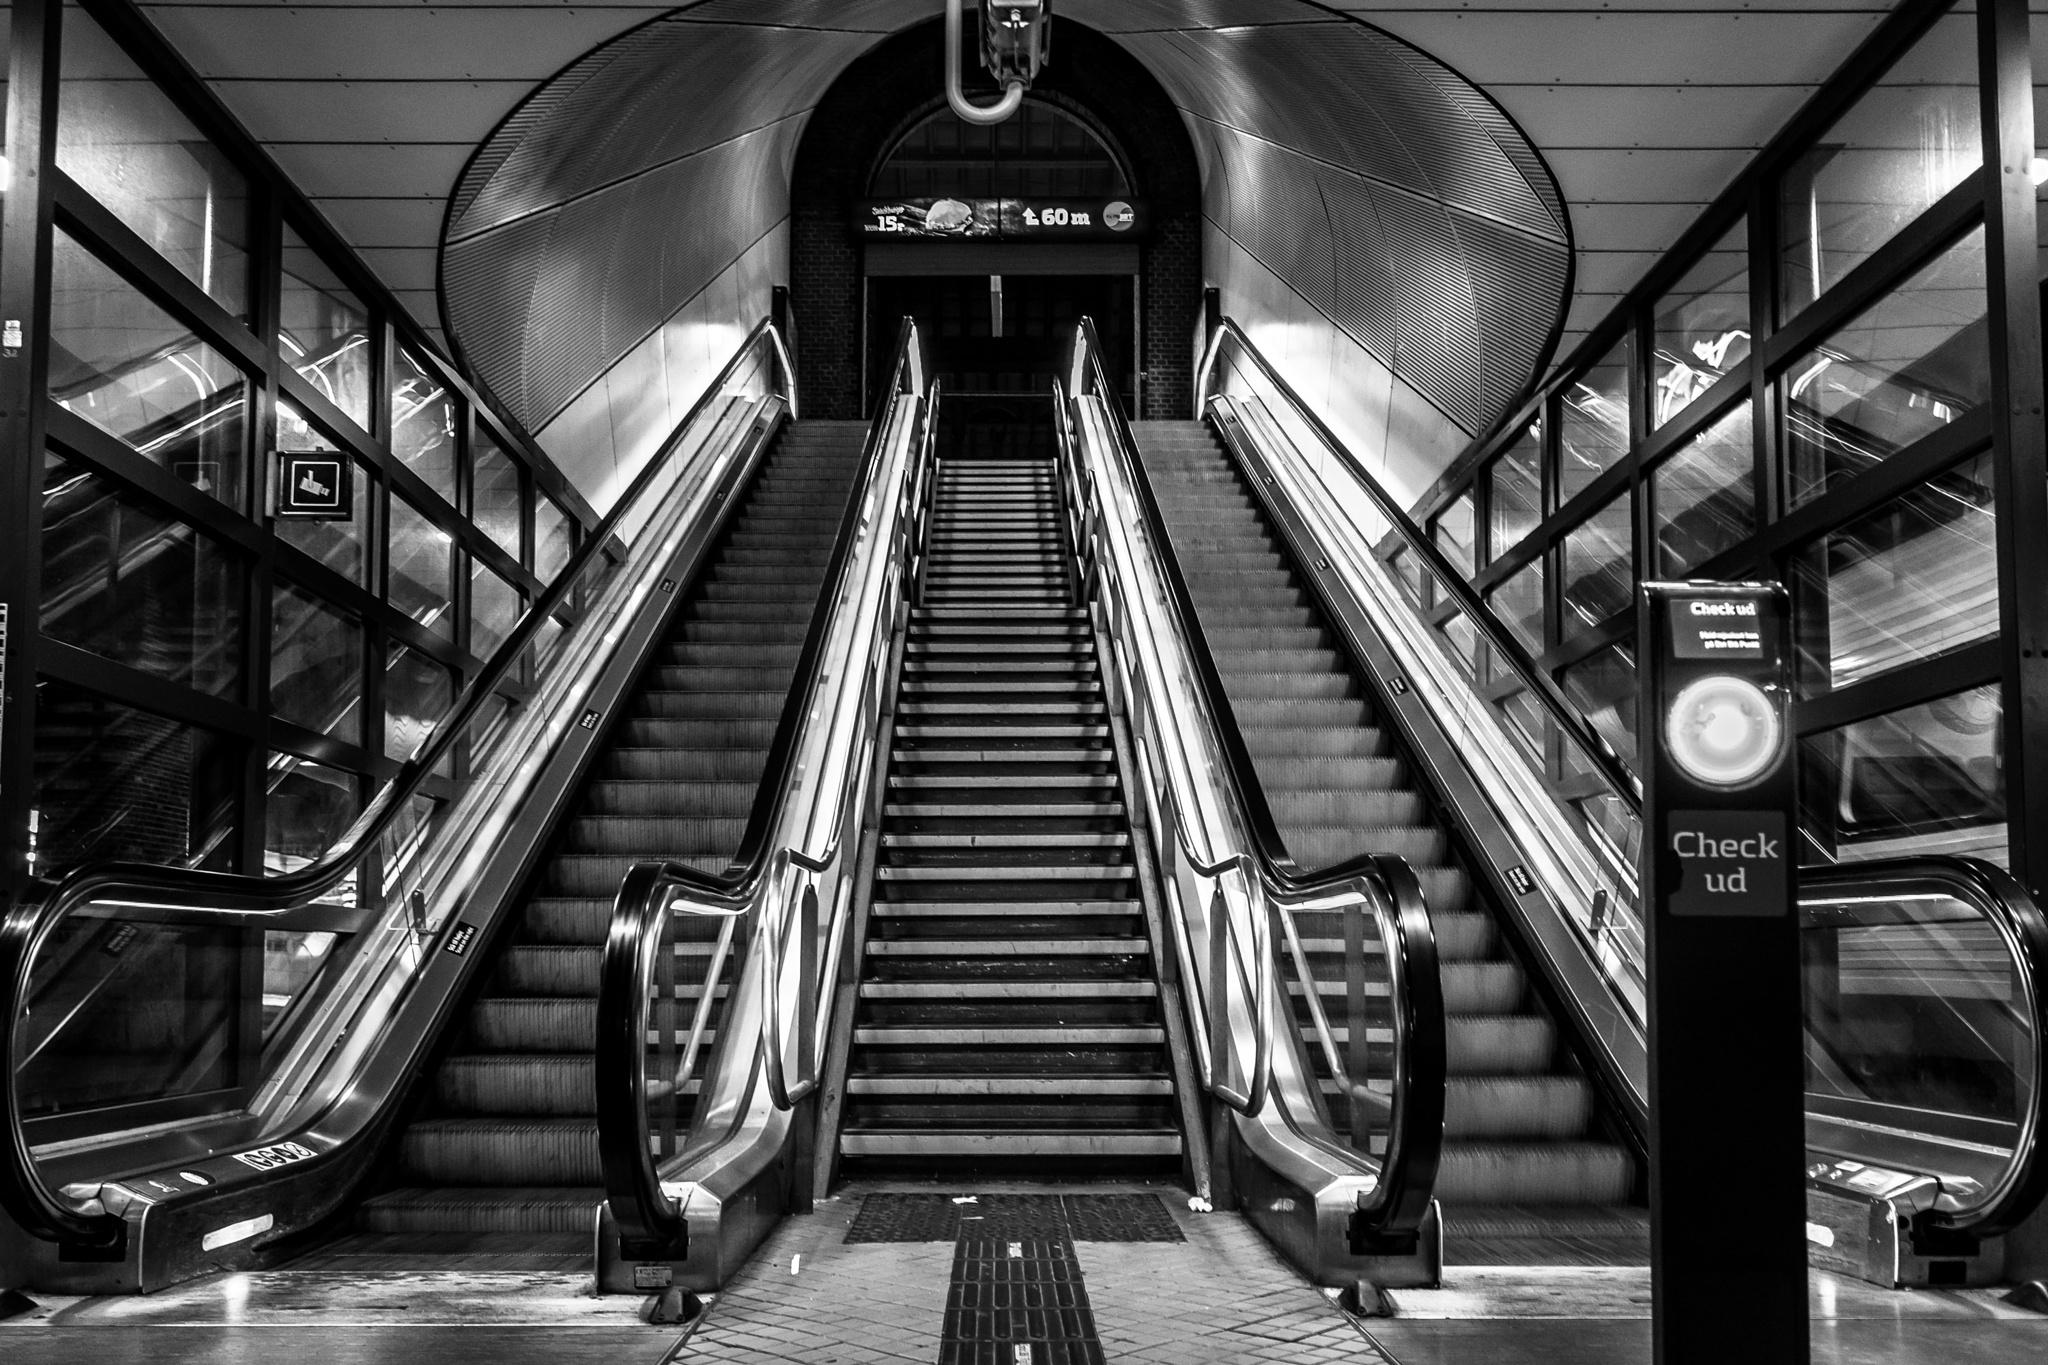 Escalator by Pekeroth Photography